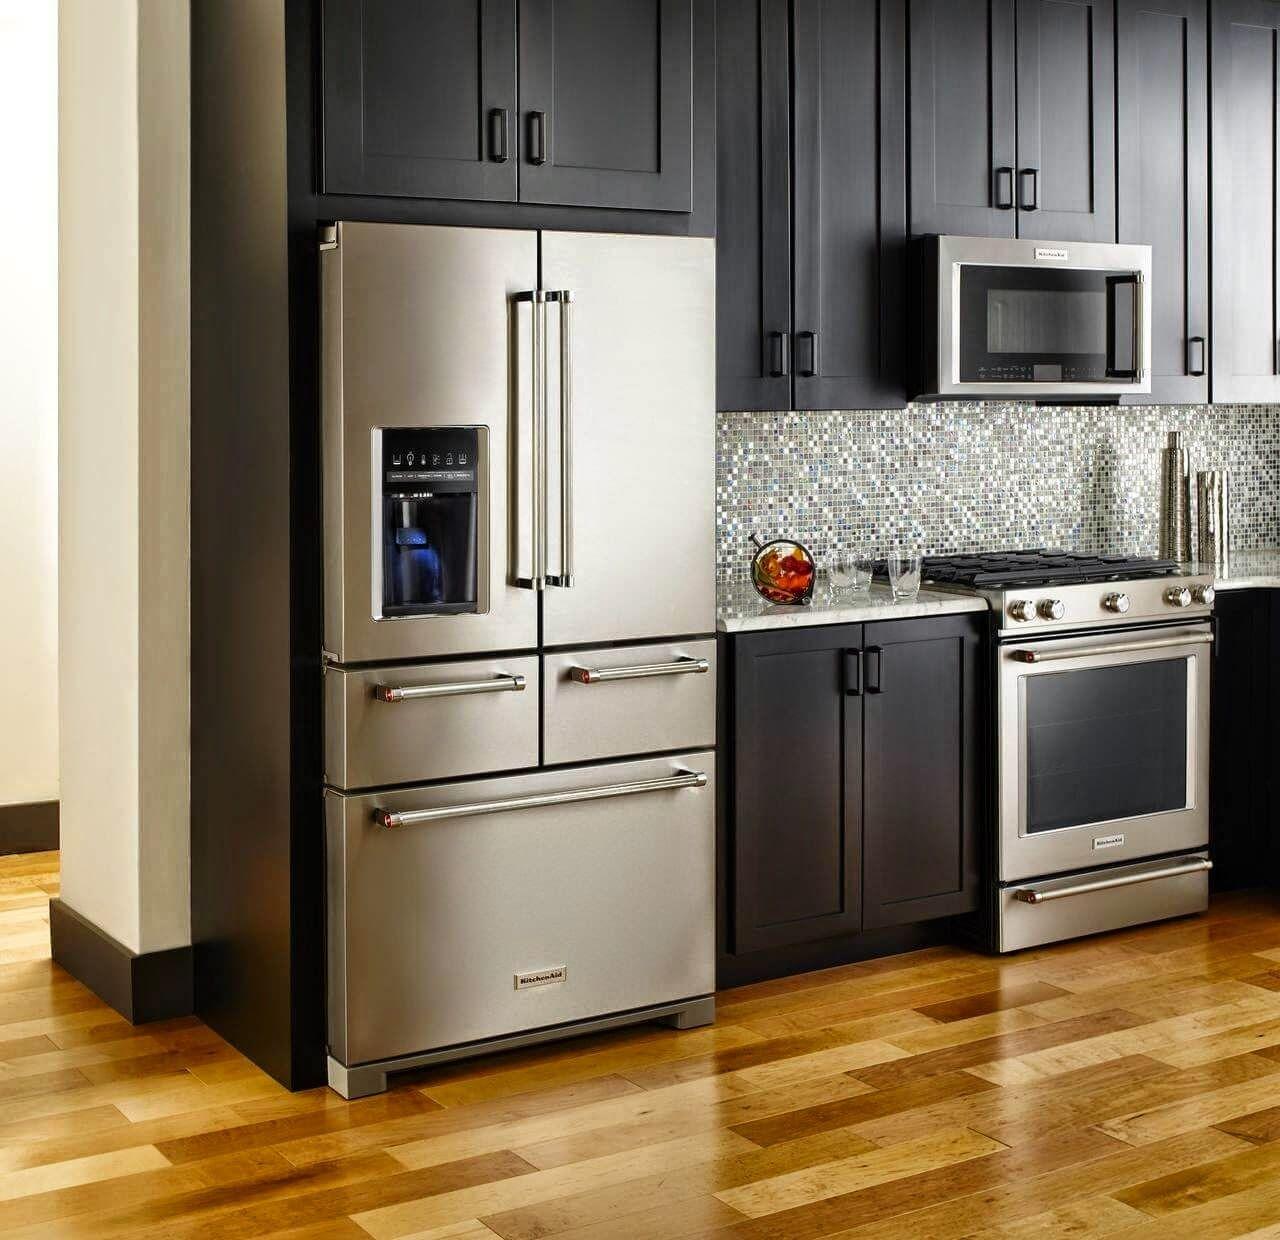 2015 5 Door KitchenAid Refrigerator  Things I Adore